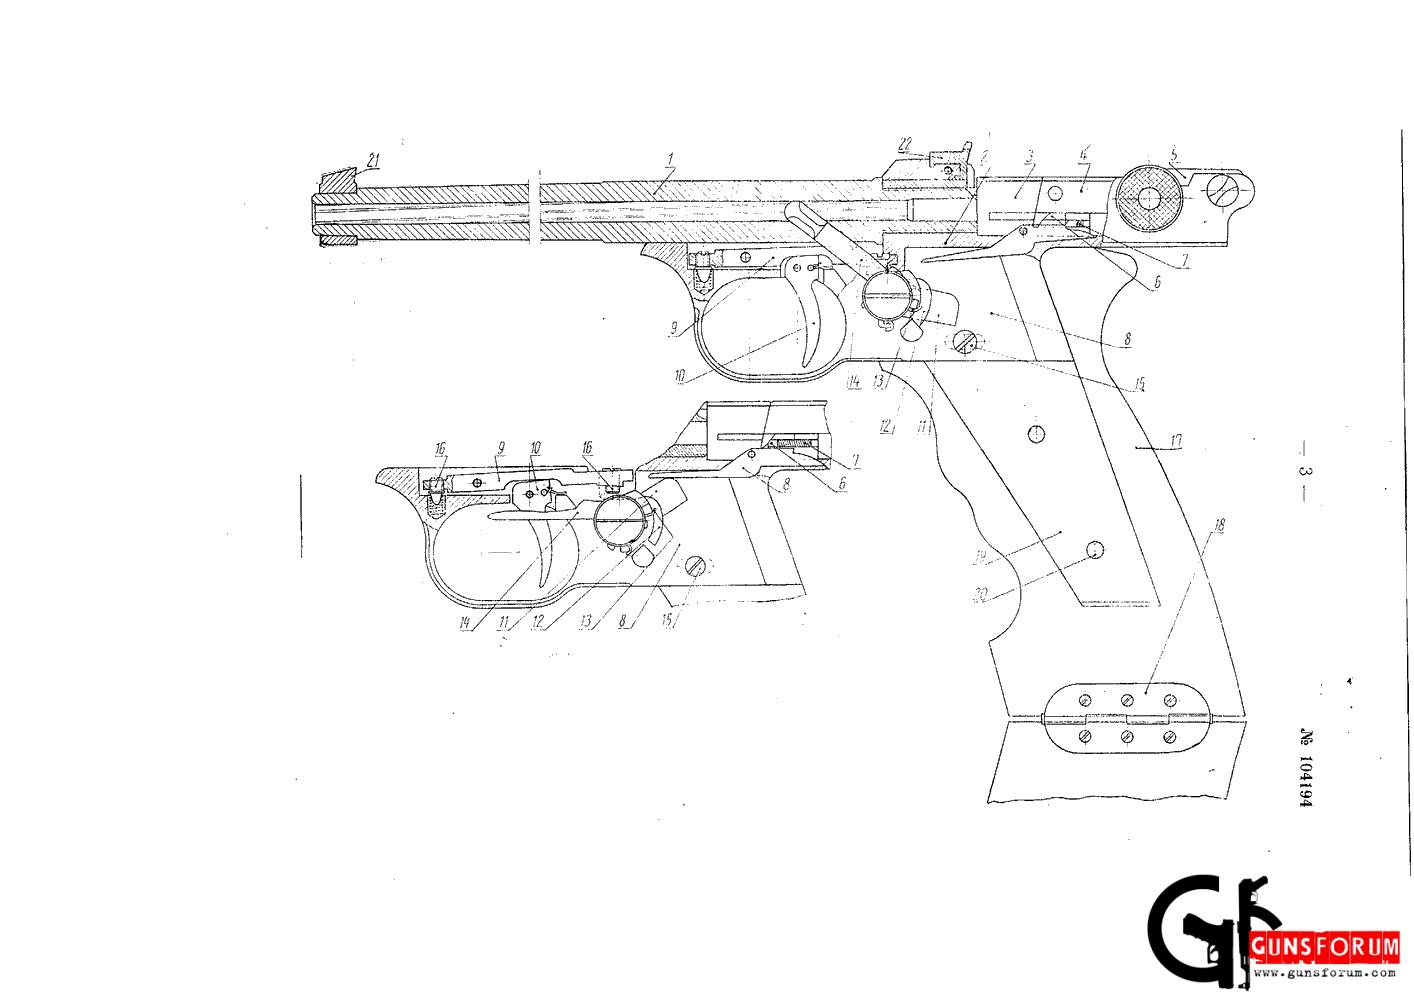 104194-odnozaryadnyjj-celevojj-pistolet-3.png